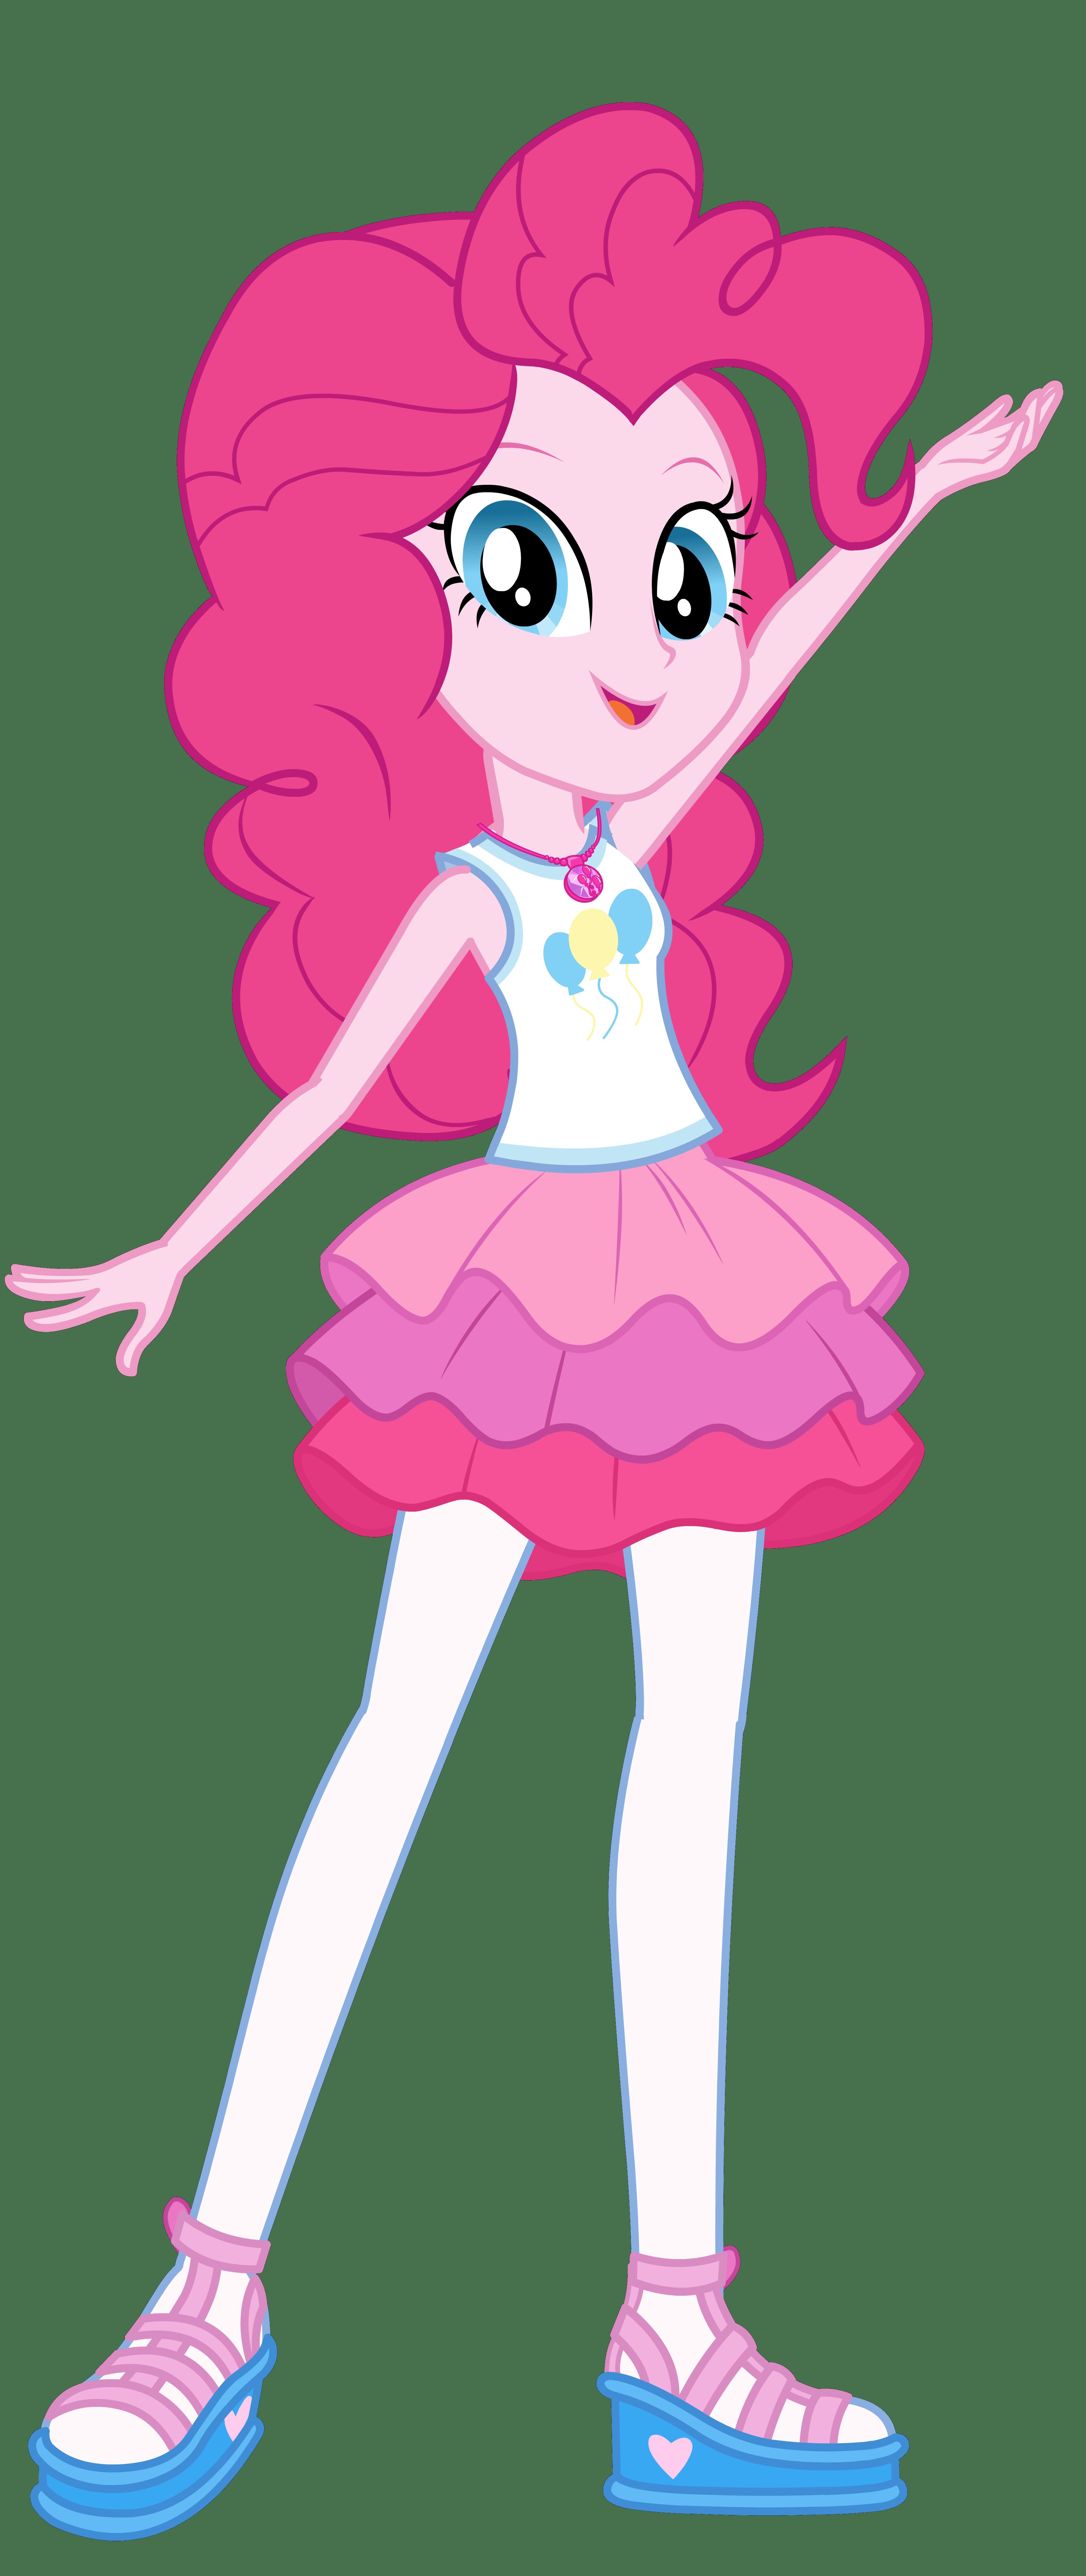 eg-character-pinkiepie